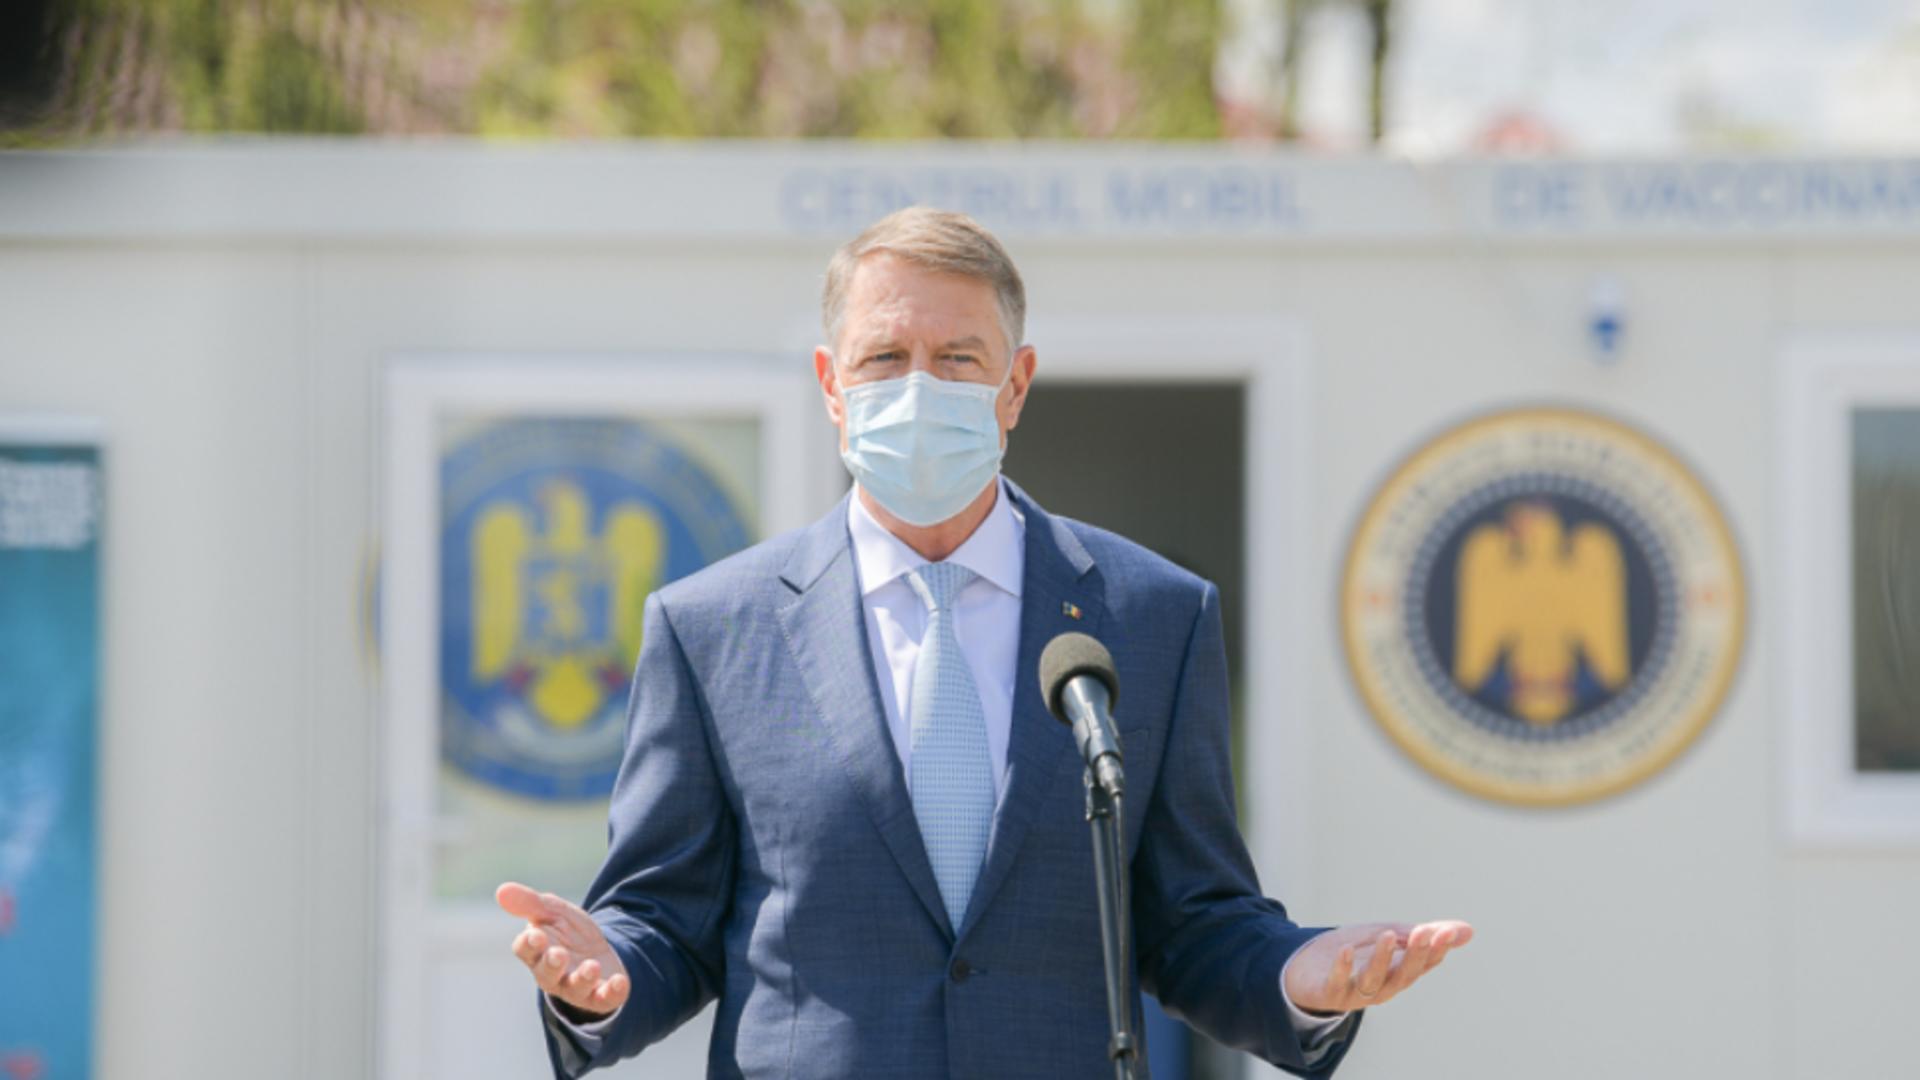 Președintele României - Klaus Iohannis / Foto: Administrația Prezidențială